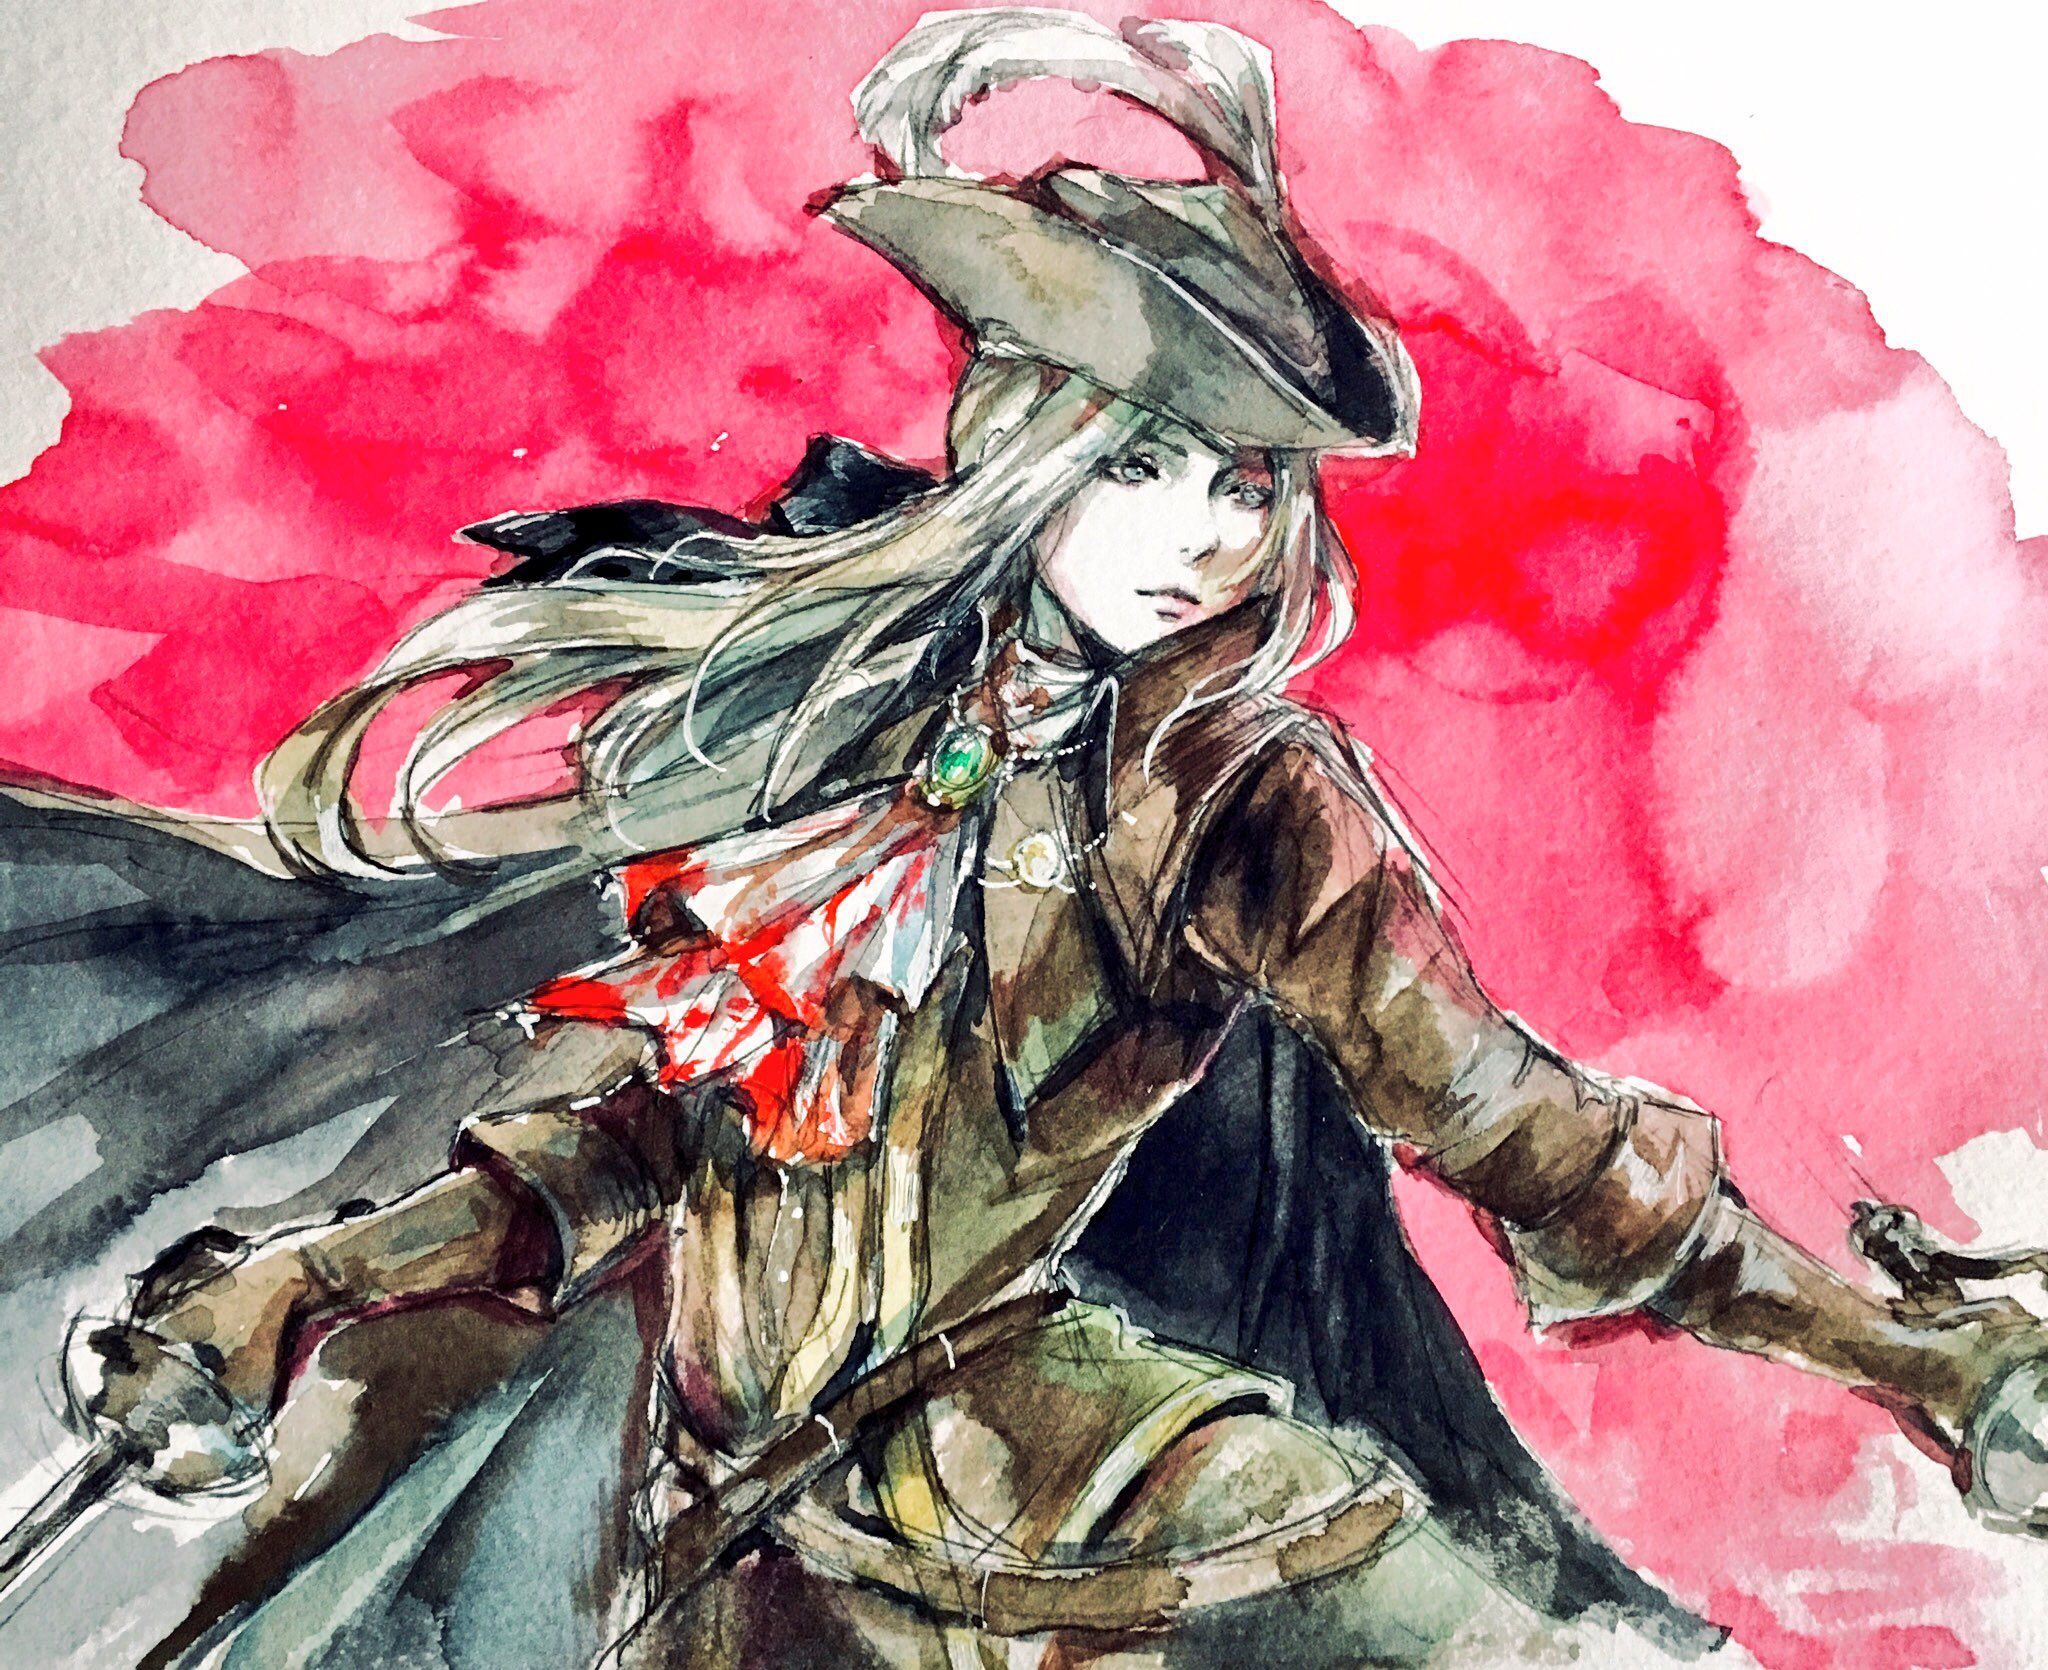 Pin by ironscotch on Dark Souls/ Bloodborne Dark souls